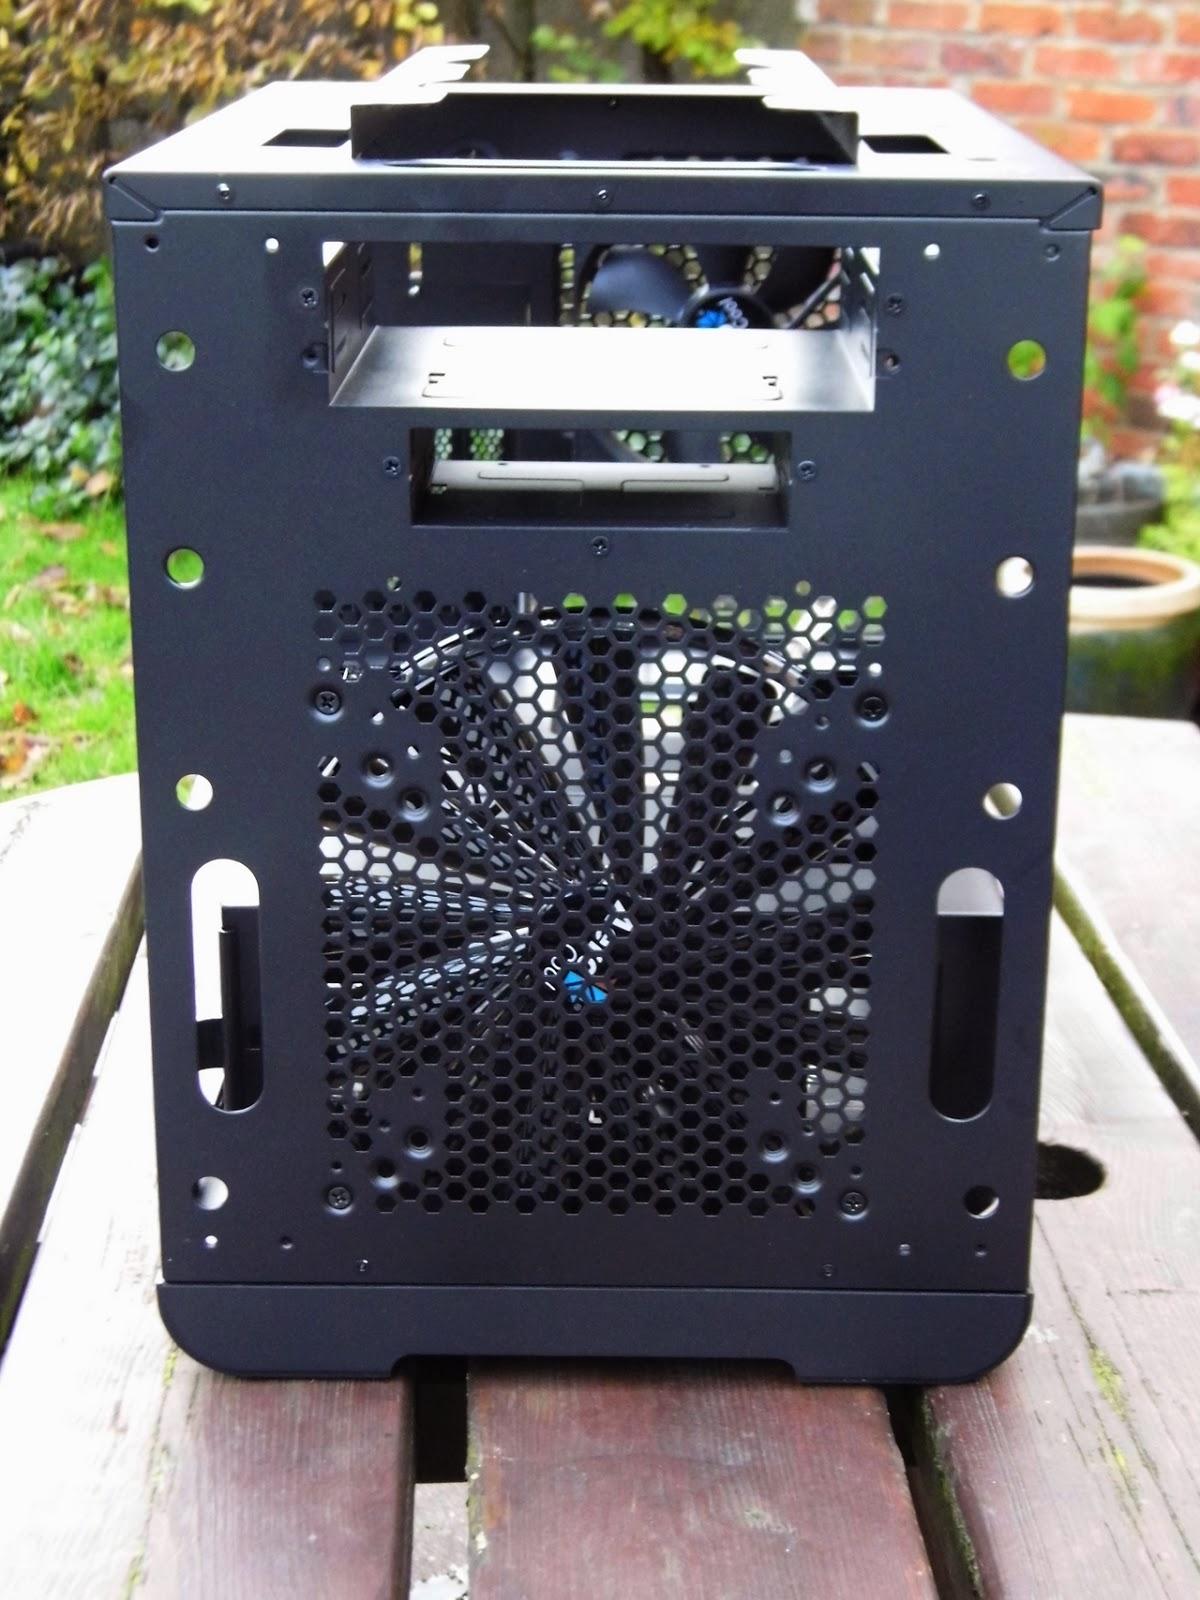 la-centrale-du-hardware-test-boitier-aerocol-ds-dead-silence-cube-façade